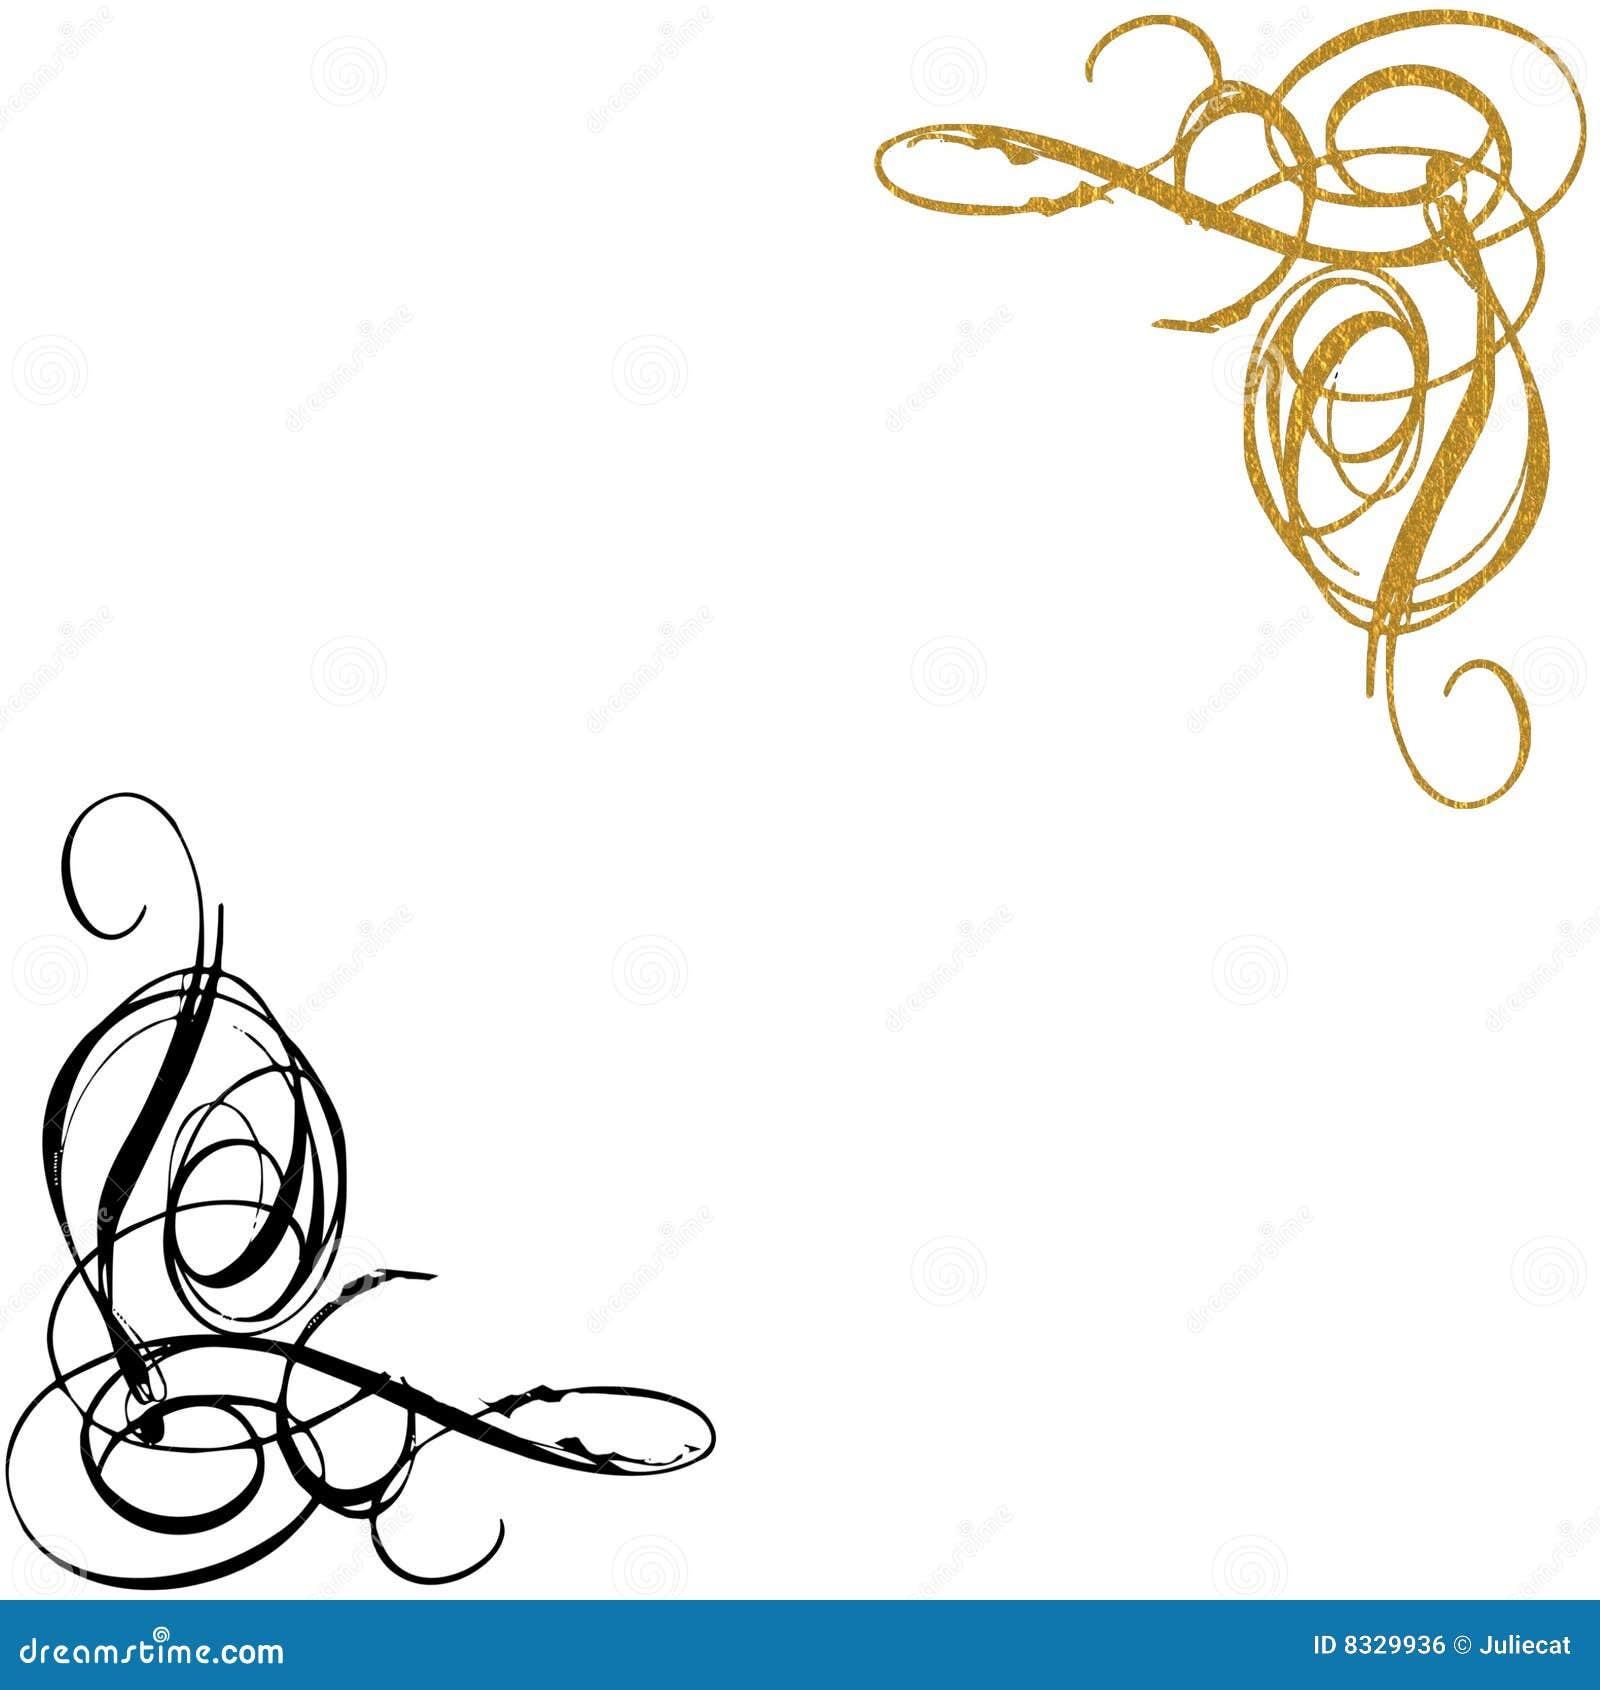 Gold And Black Swirls Background Stock Illustration